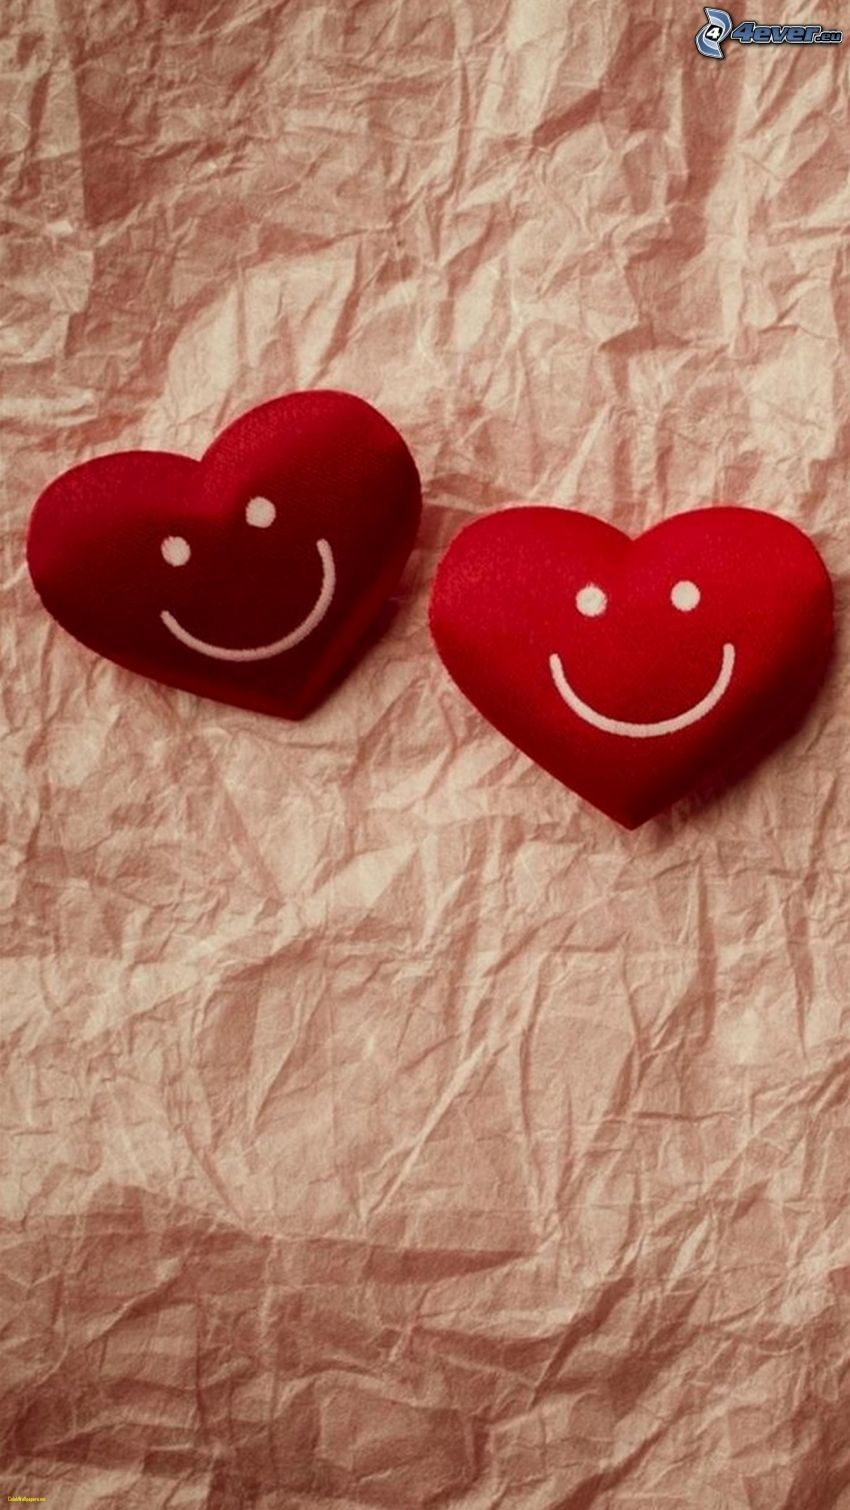 hjärtan, smiley